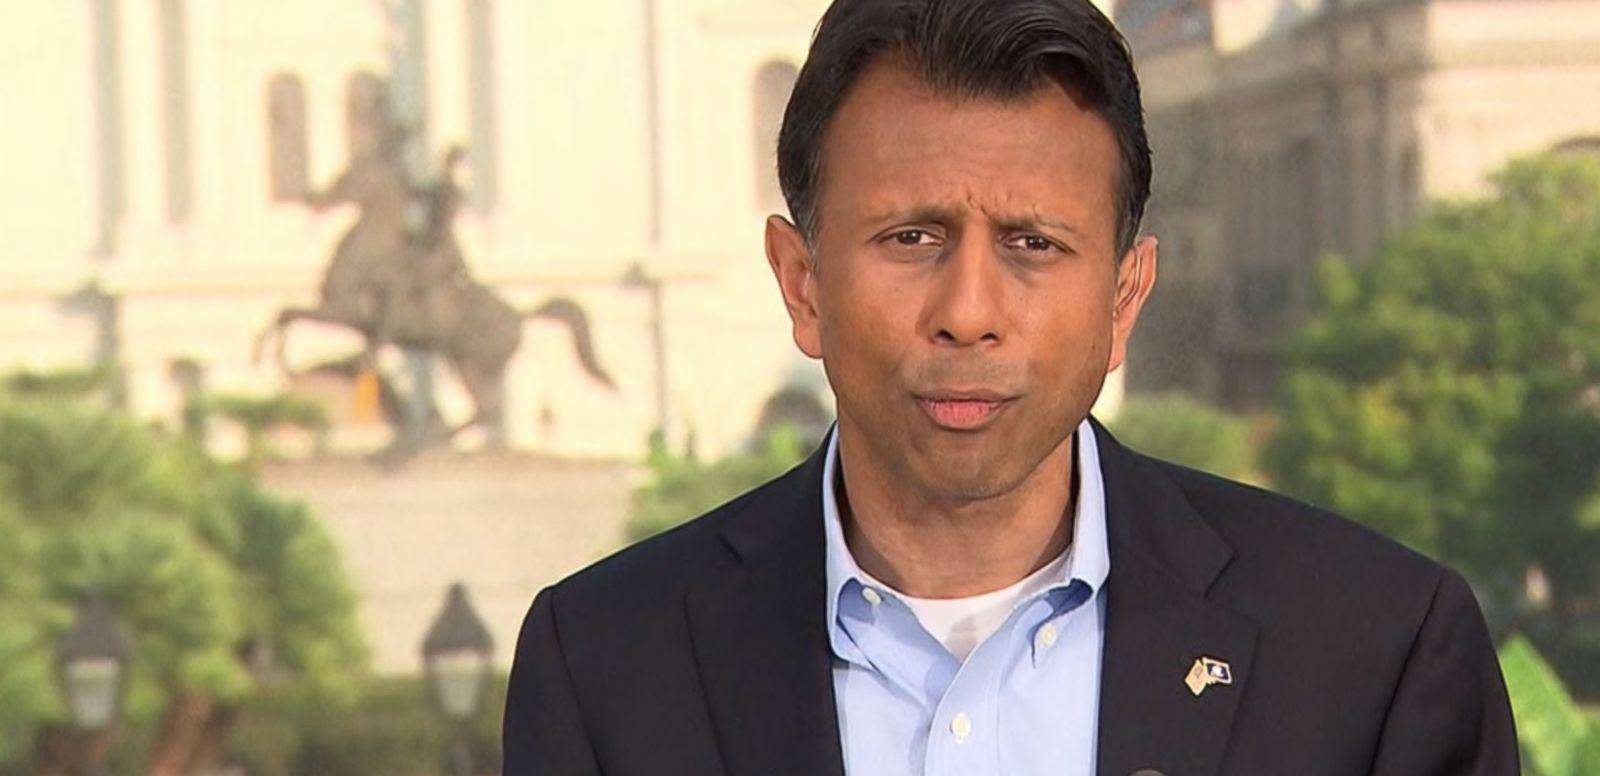 VIDEO: Gov. Bobby Jindal on Katrina Anniversary